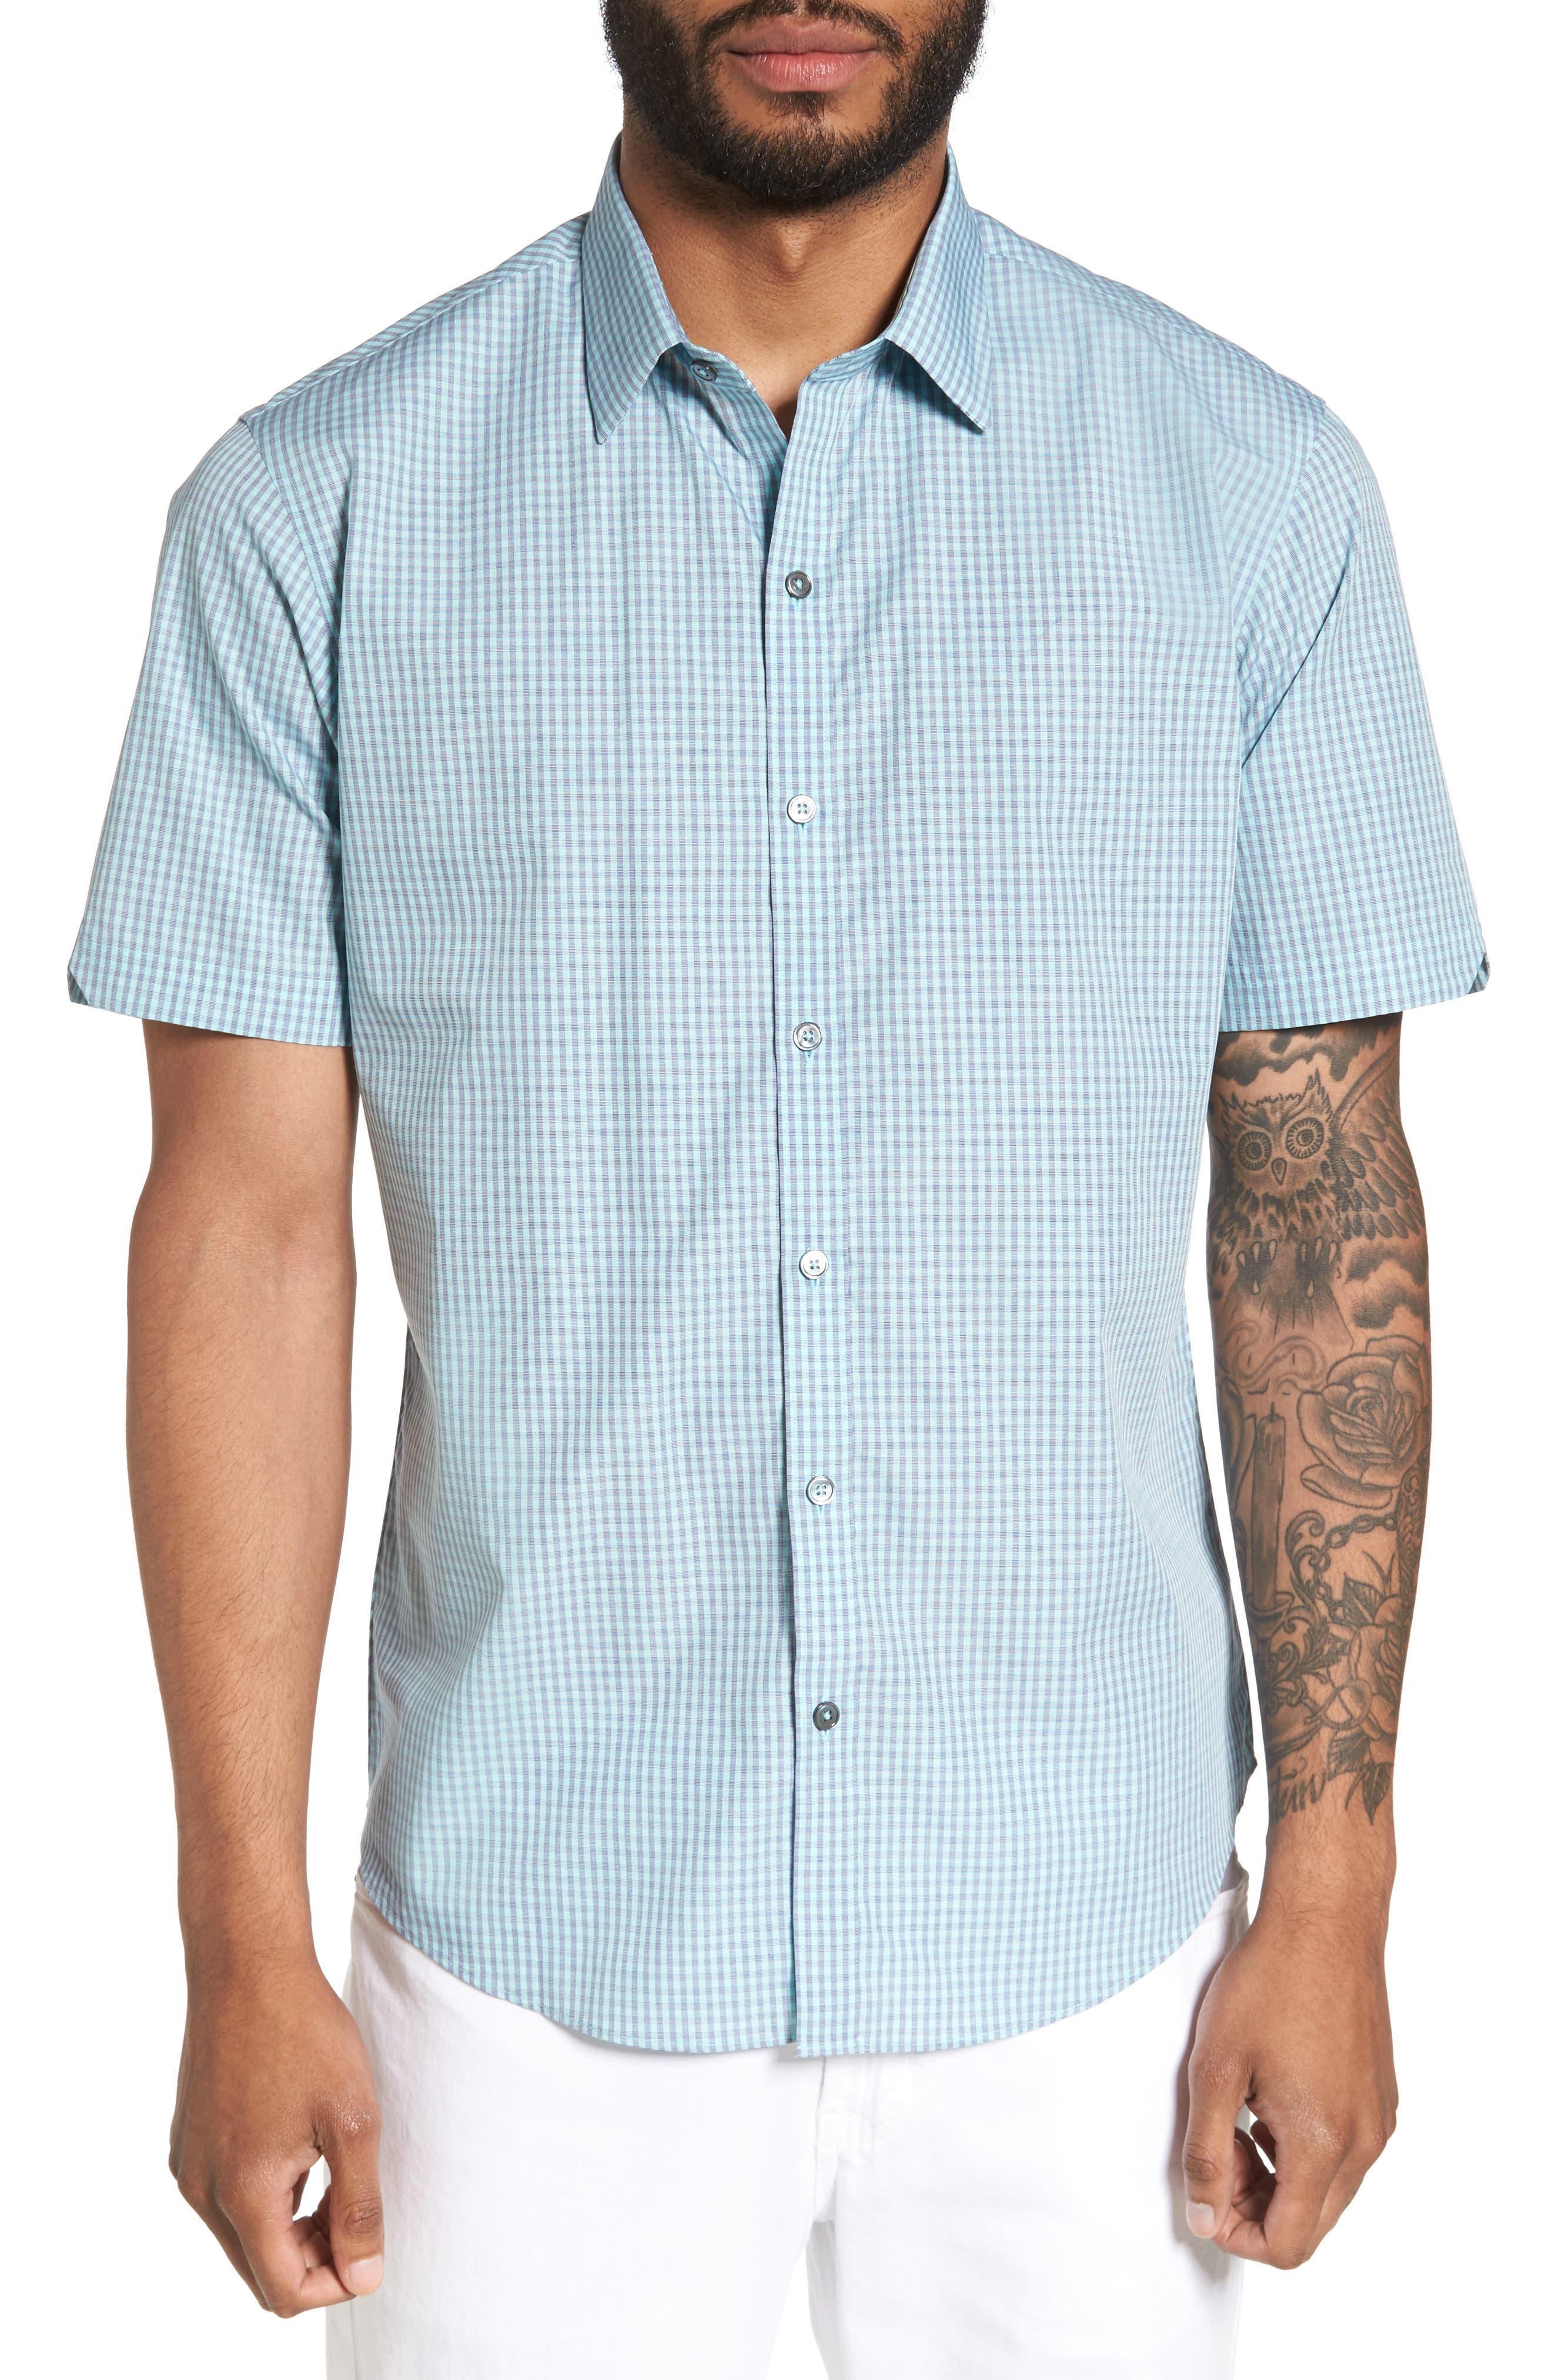 Rappaport Sport Shirt,                         Main,                         color, 332